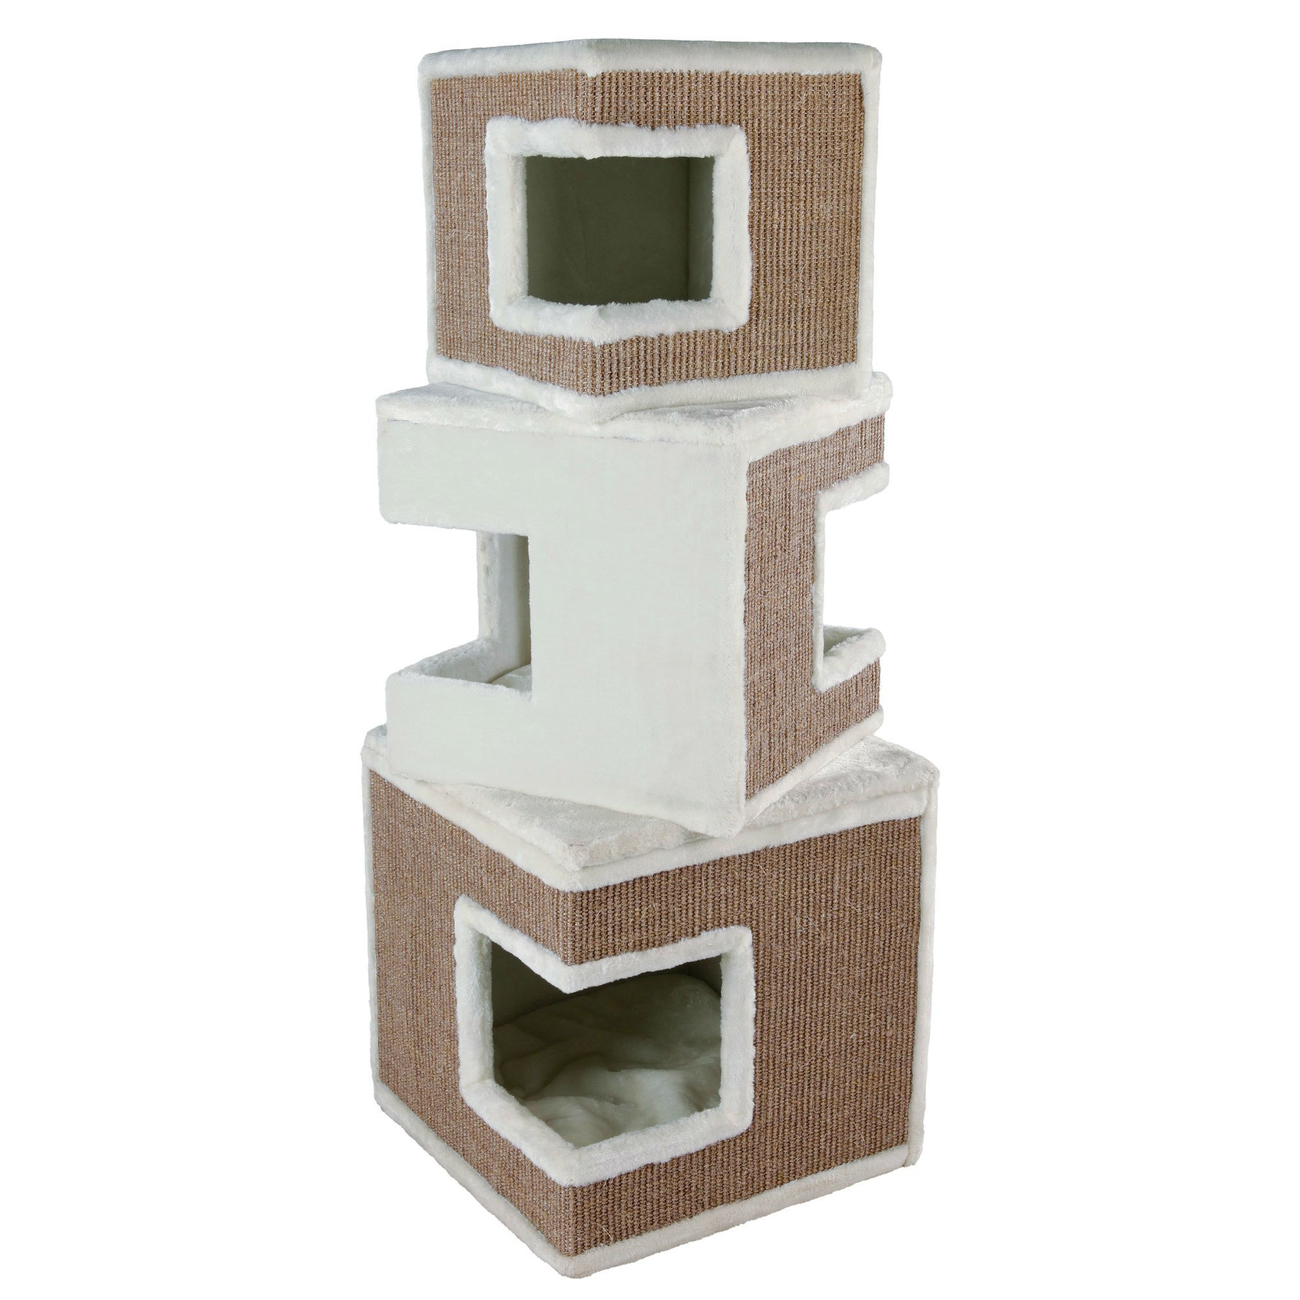 Trixie Katzenturm Cat Tower Lilo 43377, Bild 2